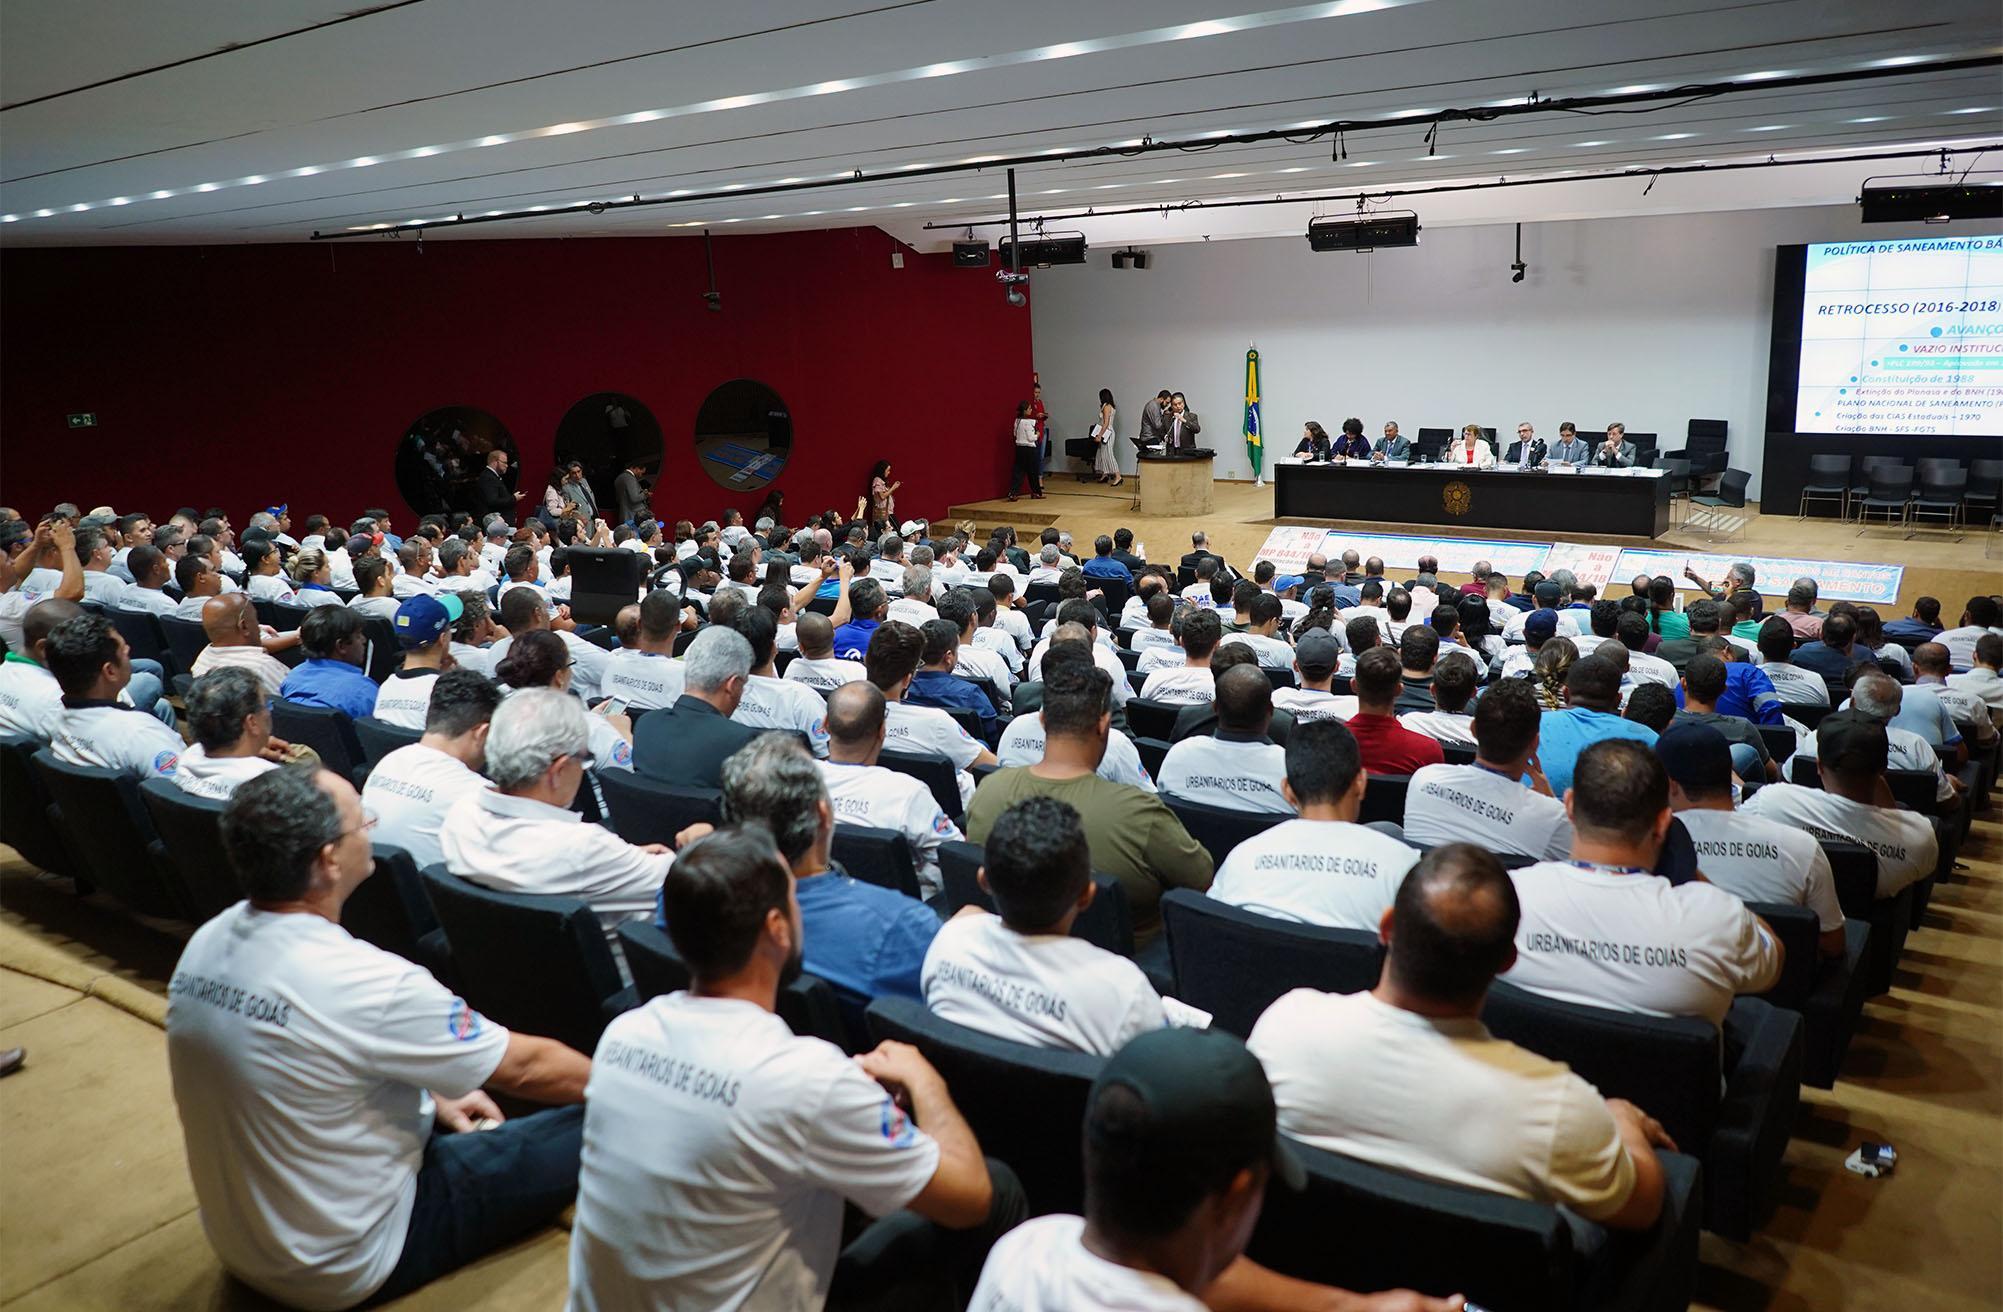 Audiência pública sobre a MP 844/18, que trata do marco legal do saneamento básico